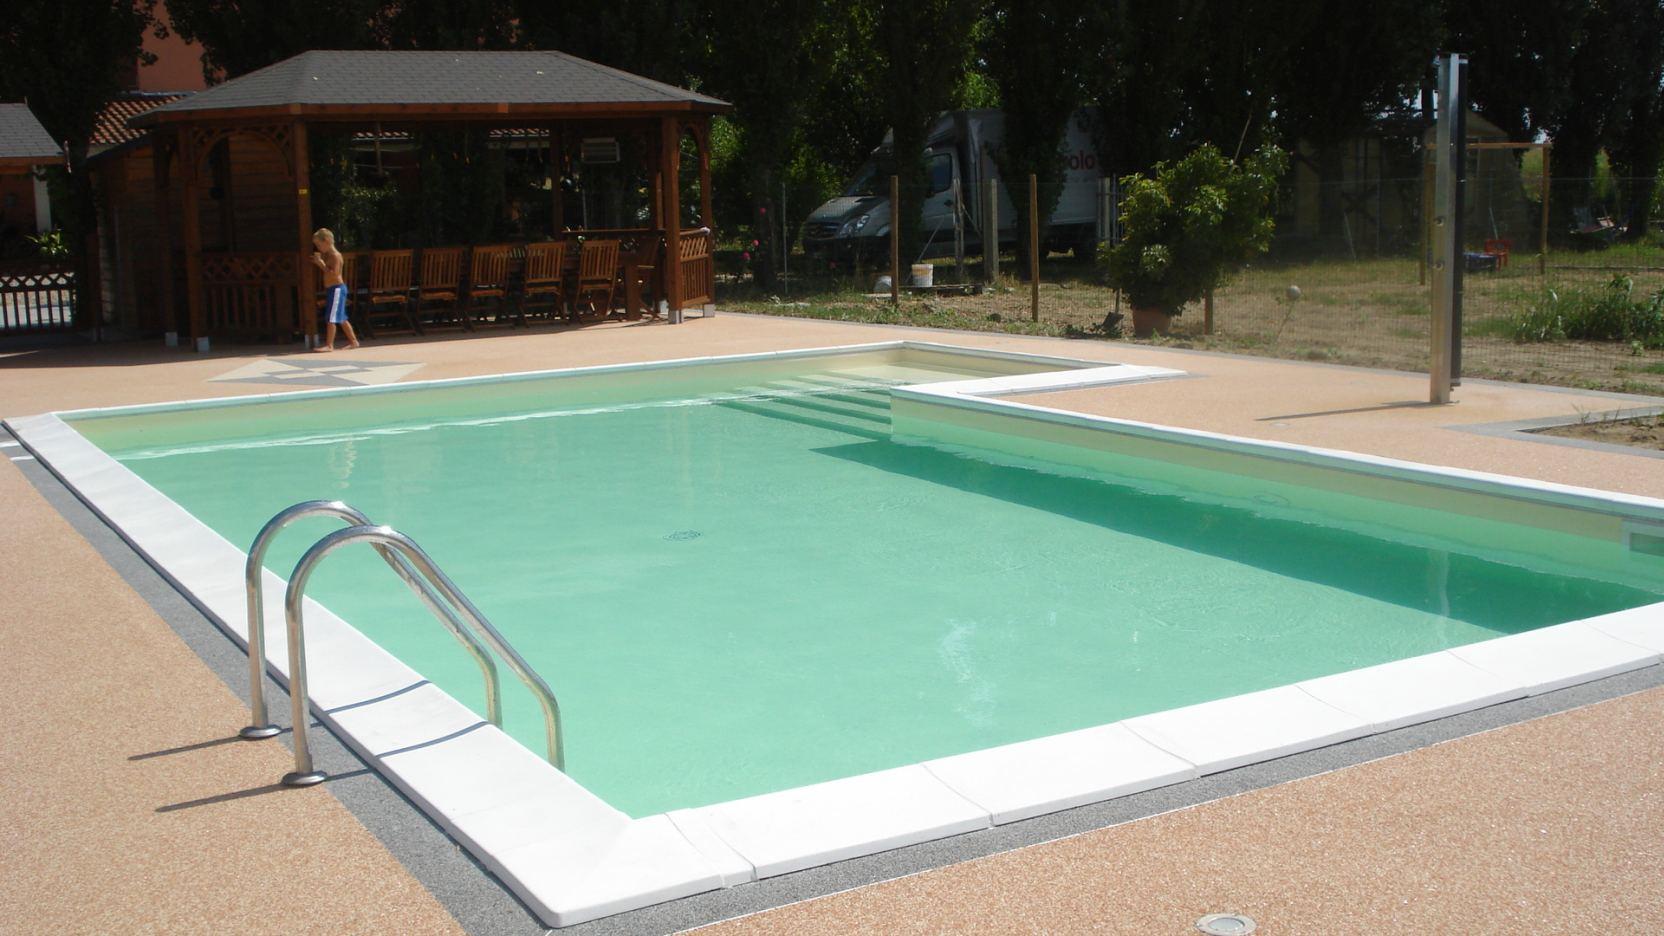 Fabbrico reggio emilia casareggio piscine piscine piscine mantova costruttori di piscine - Piscina mantova ...